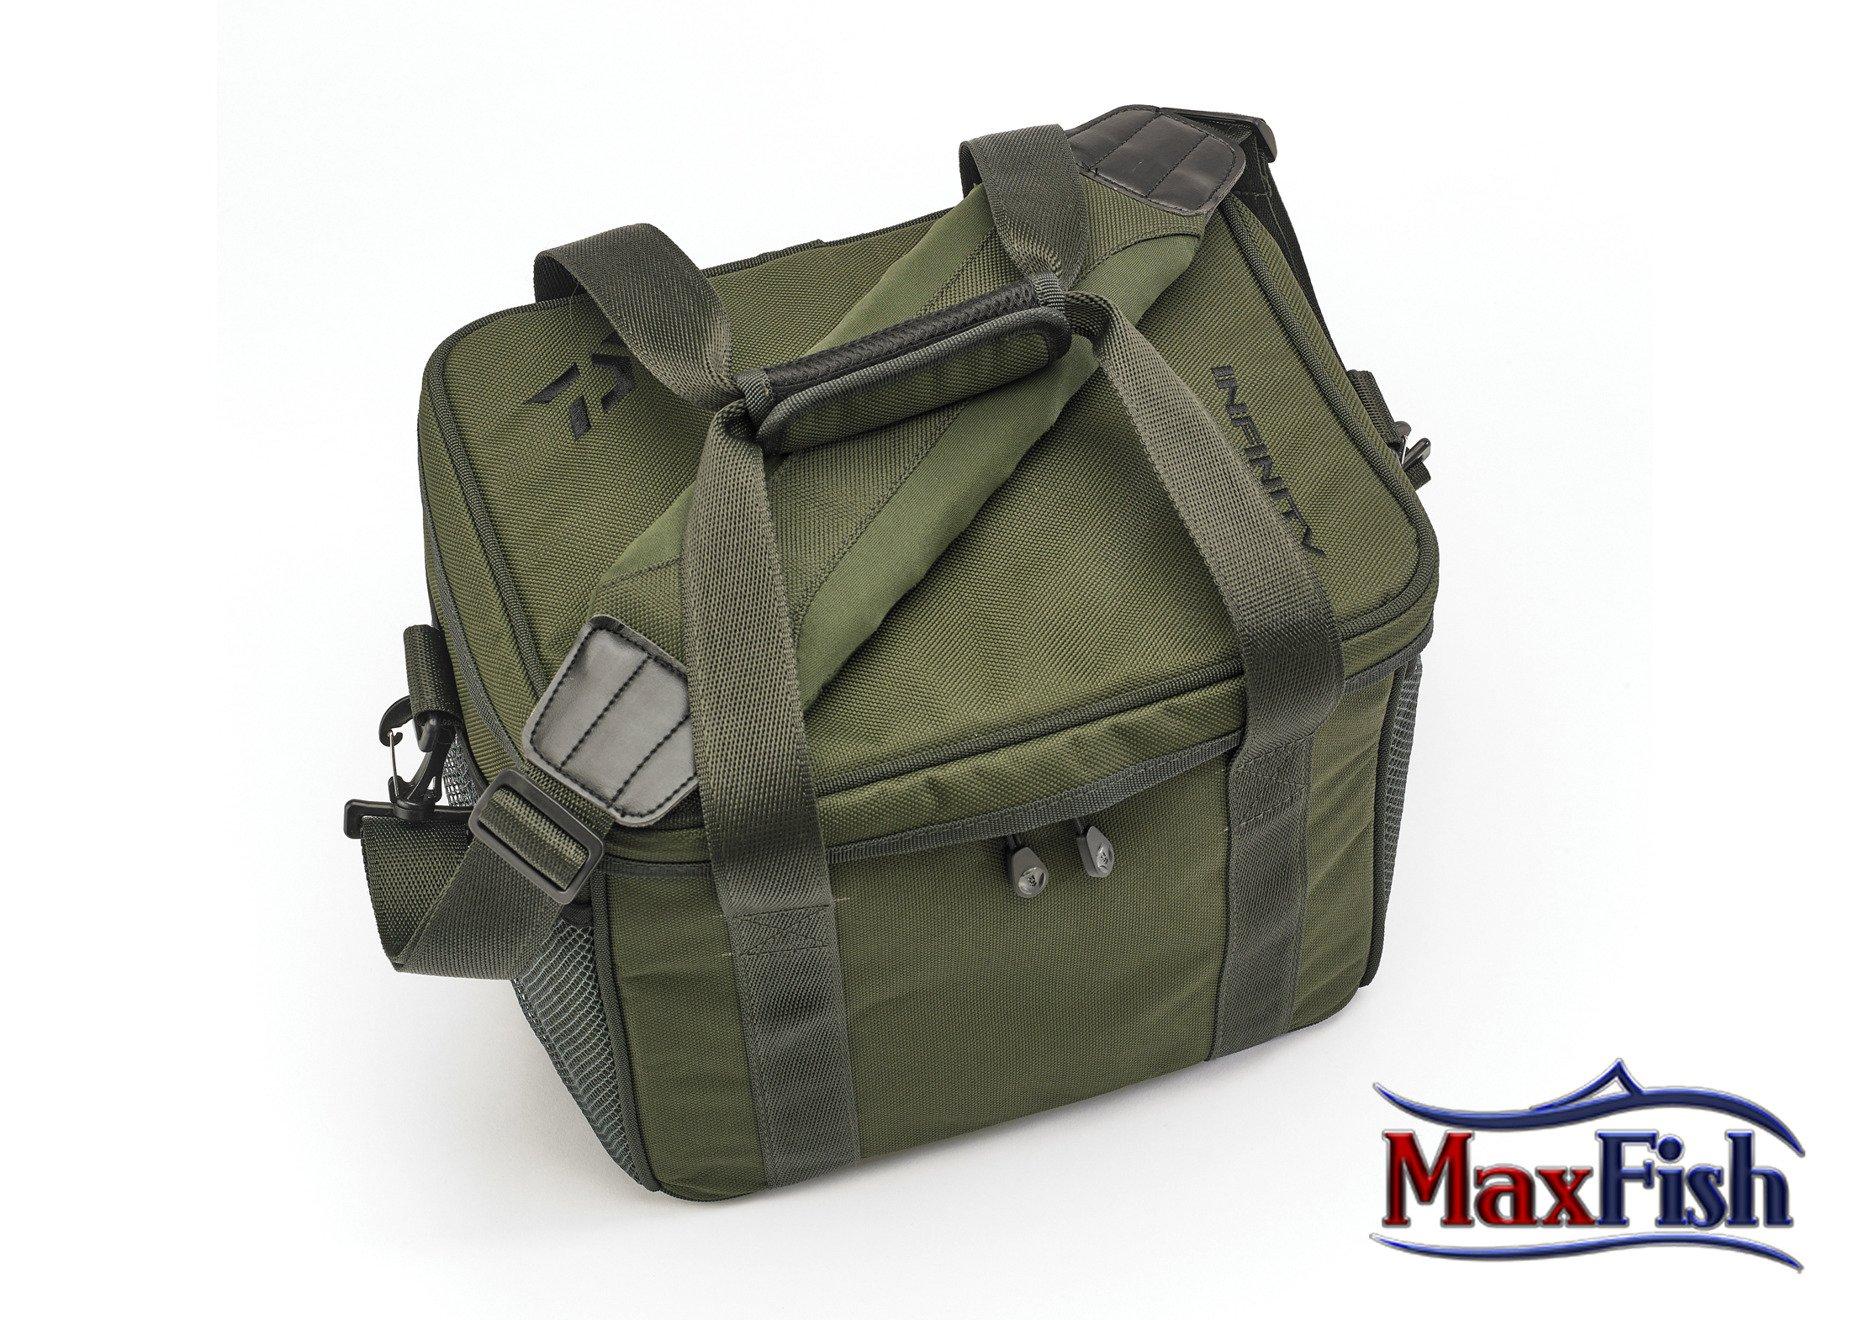 Daiwa Torba Infinity Cooler Bag 32x26x25cm